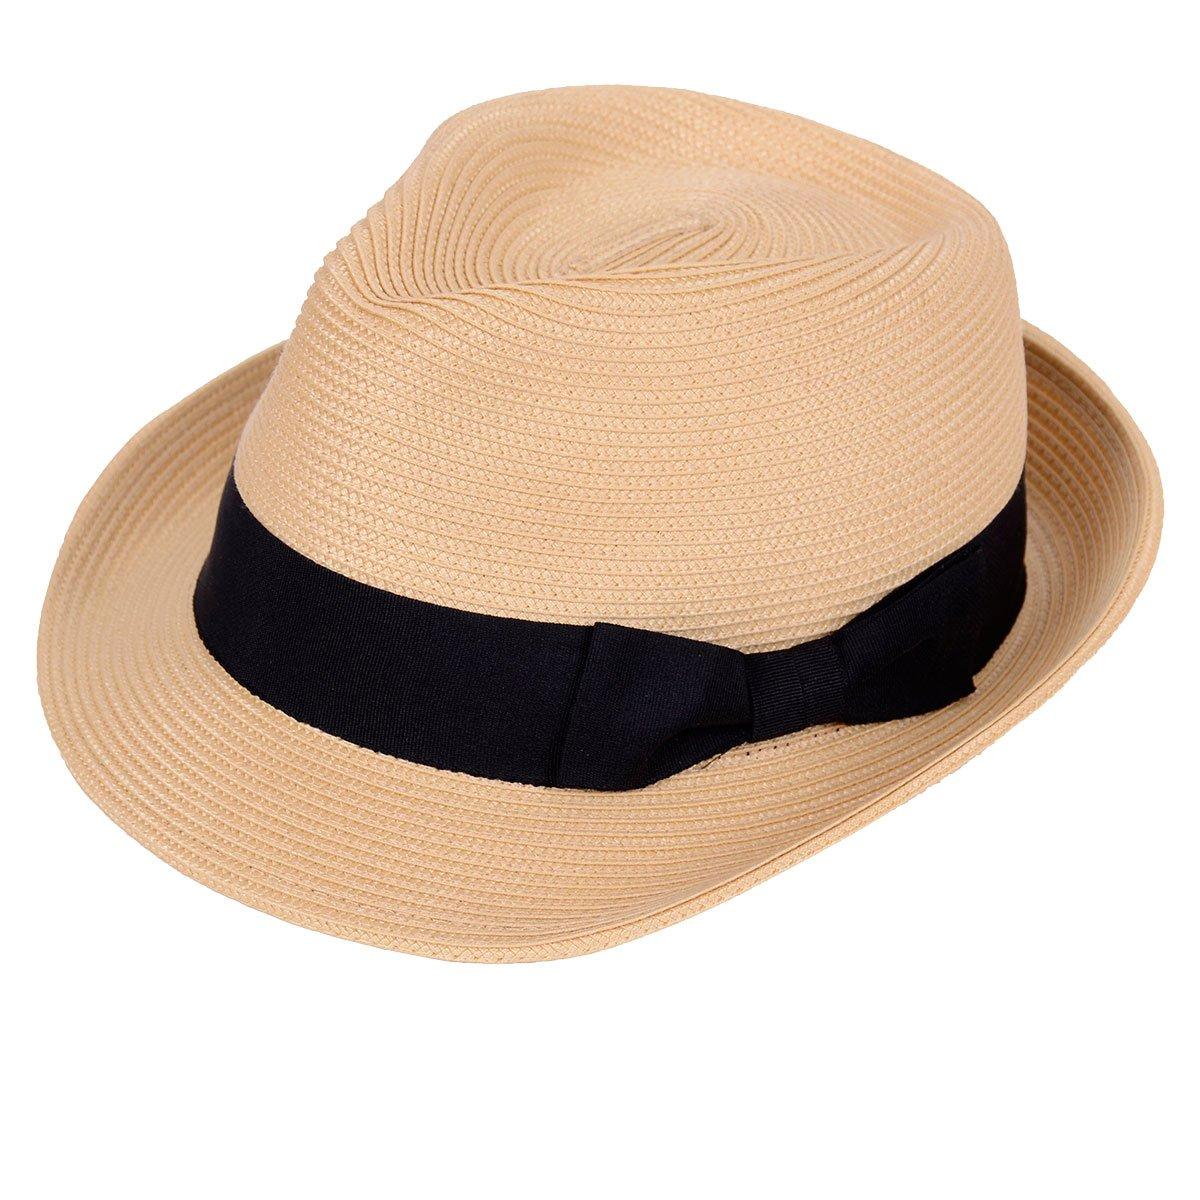 Straw Fedora Hat Sun Trilby Unisex Summer Beach Hats Fashion Panama with Short Brim for Men and Women(B-Straw-Yellow)